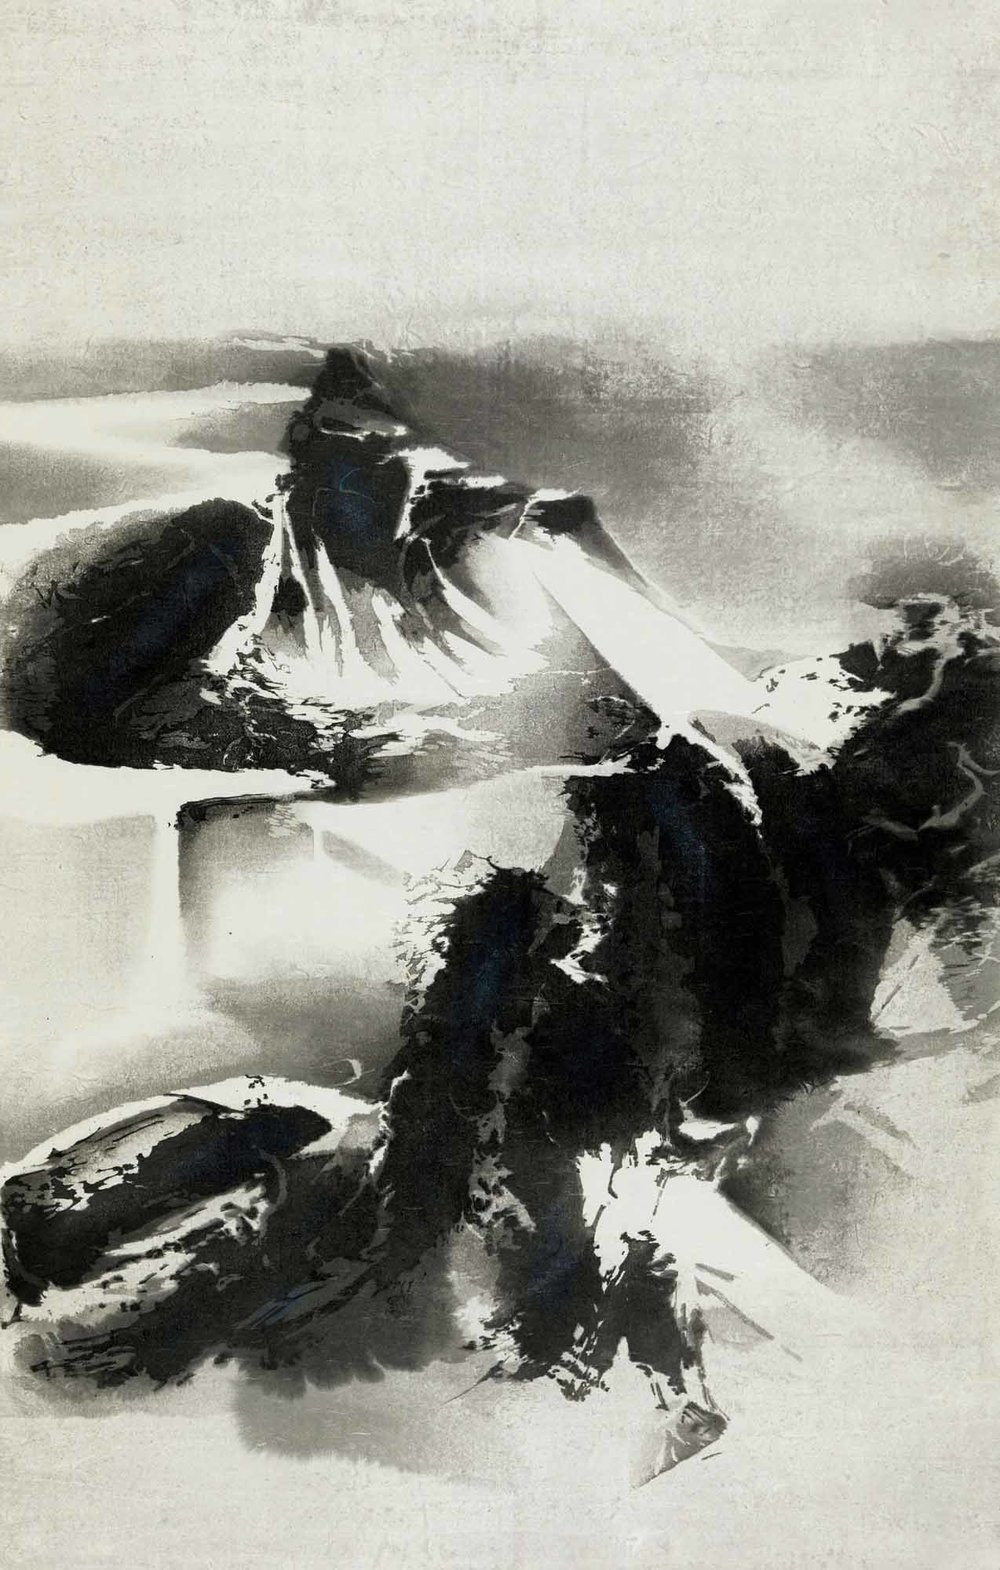 劉國松 LIU Kuo-Sung〈寒山雪霽 Wintery Mountains covered with Snow〉